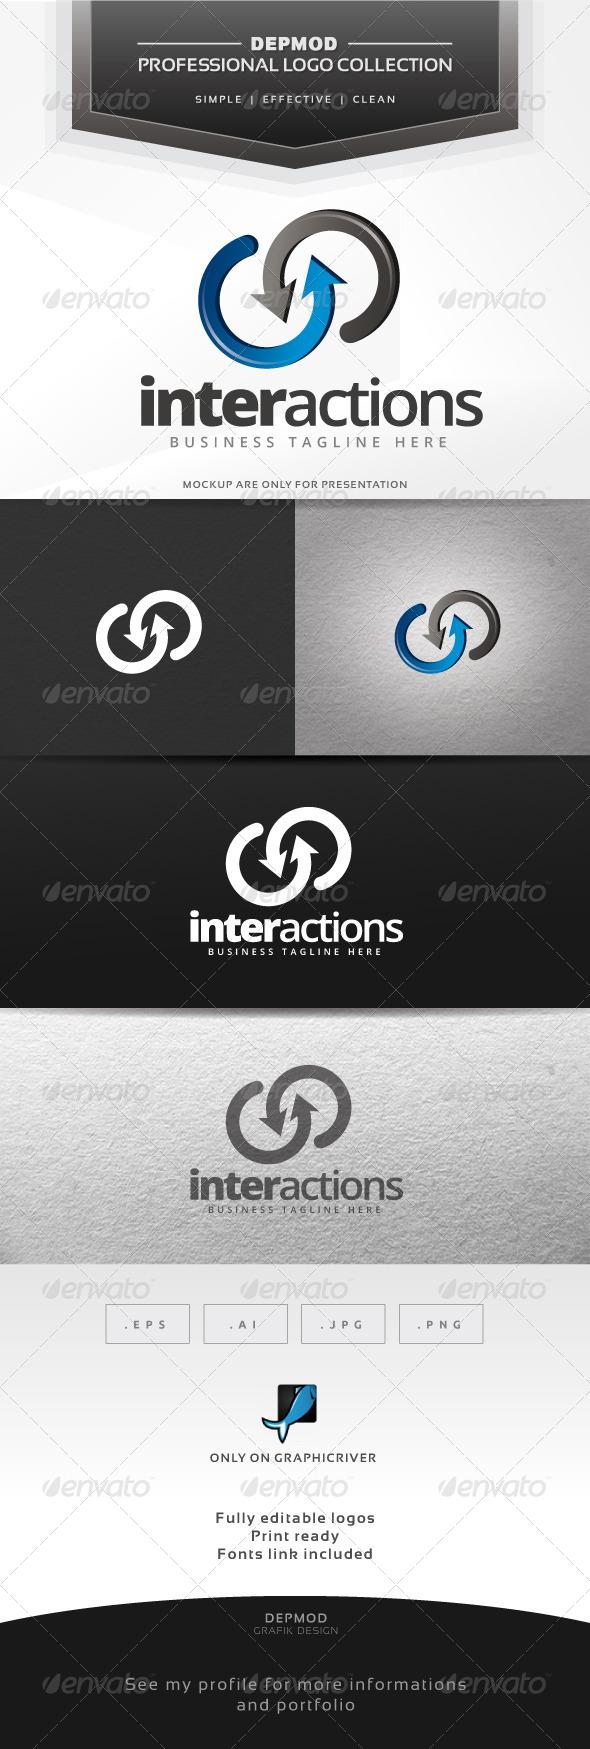 Interactions Logo - Abstract Logo Templates